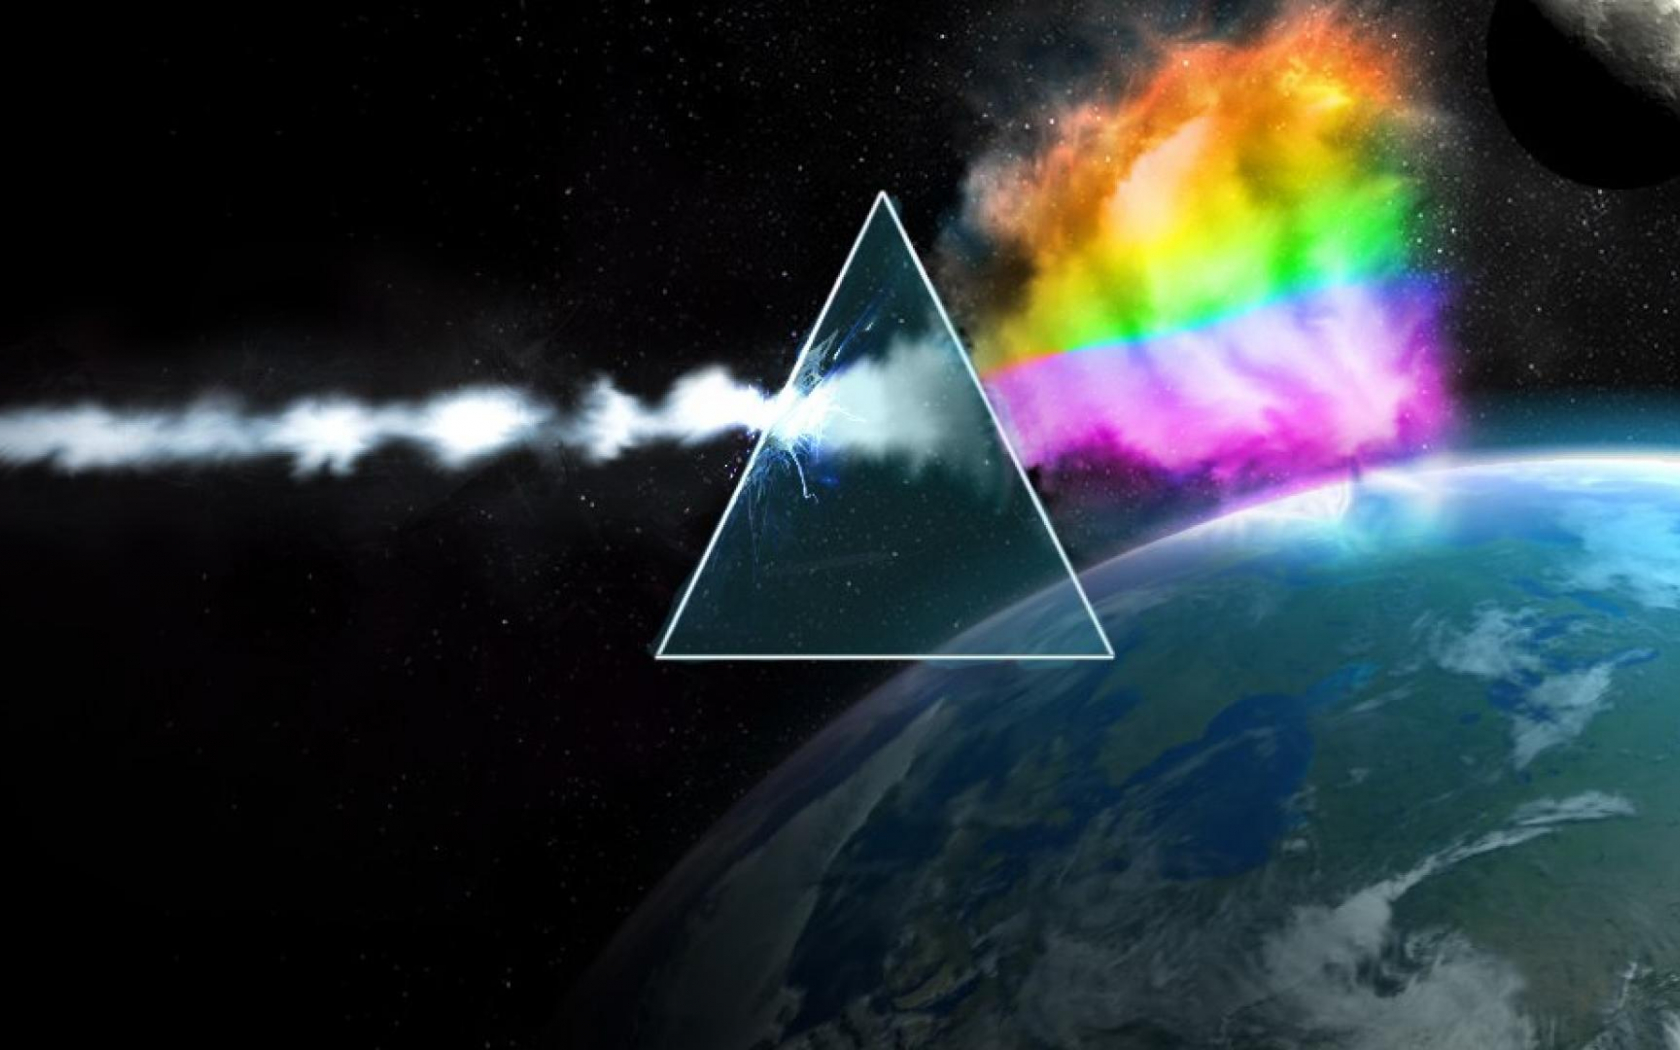 Free Download Pink Floyd Hd Wallpaper 25174 Hq Desktop